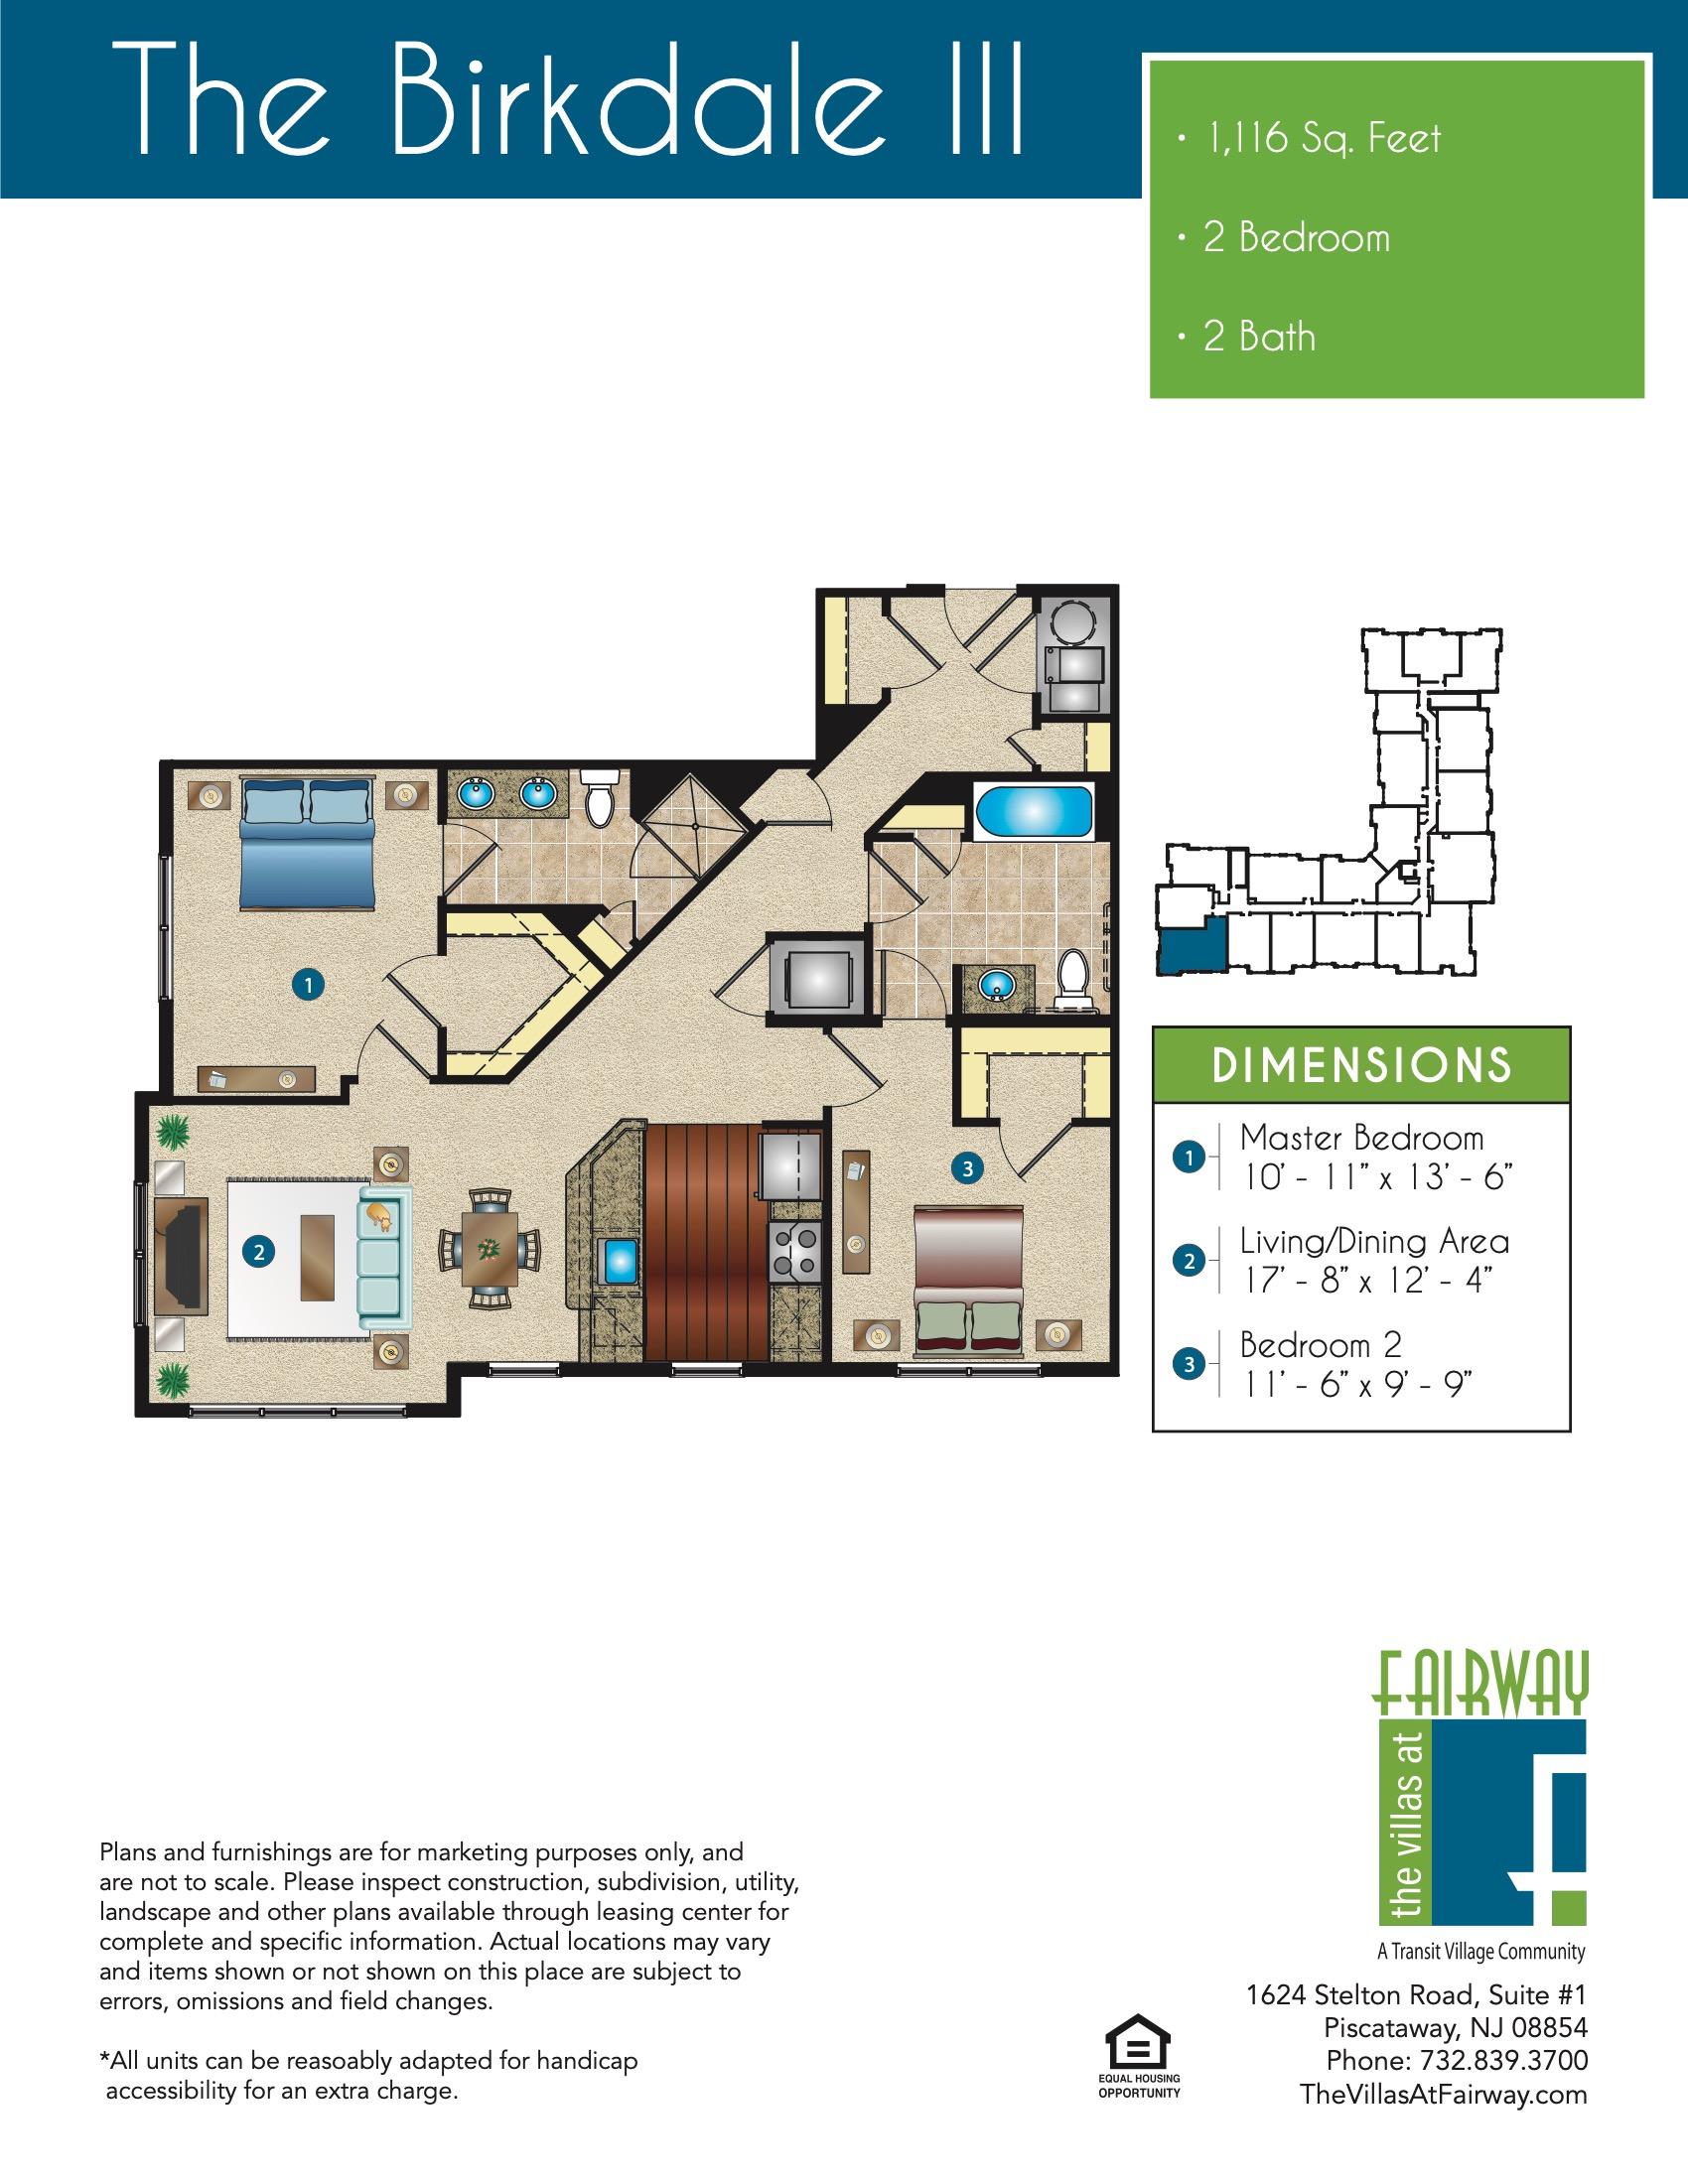 The Birkdale III Floor Plan